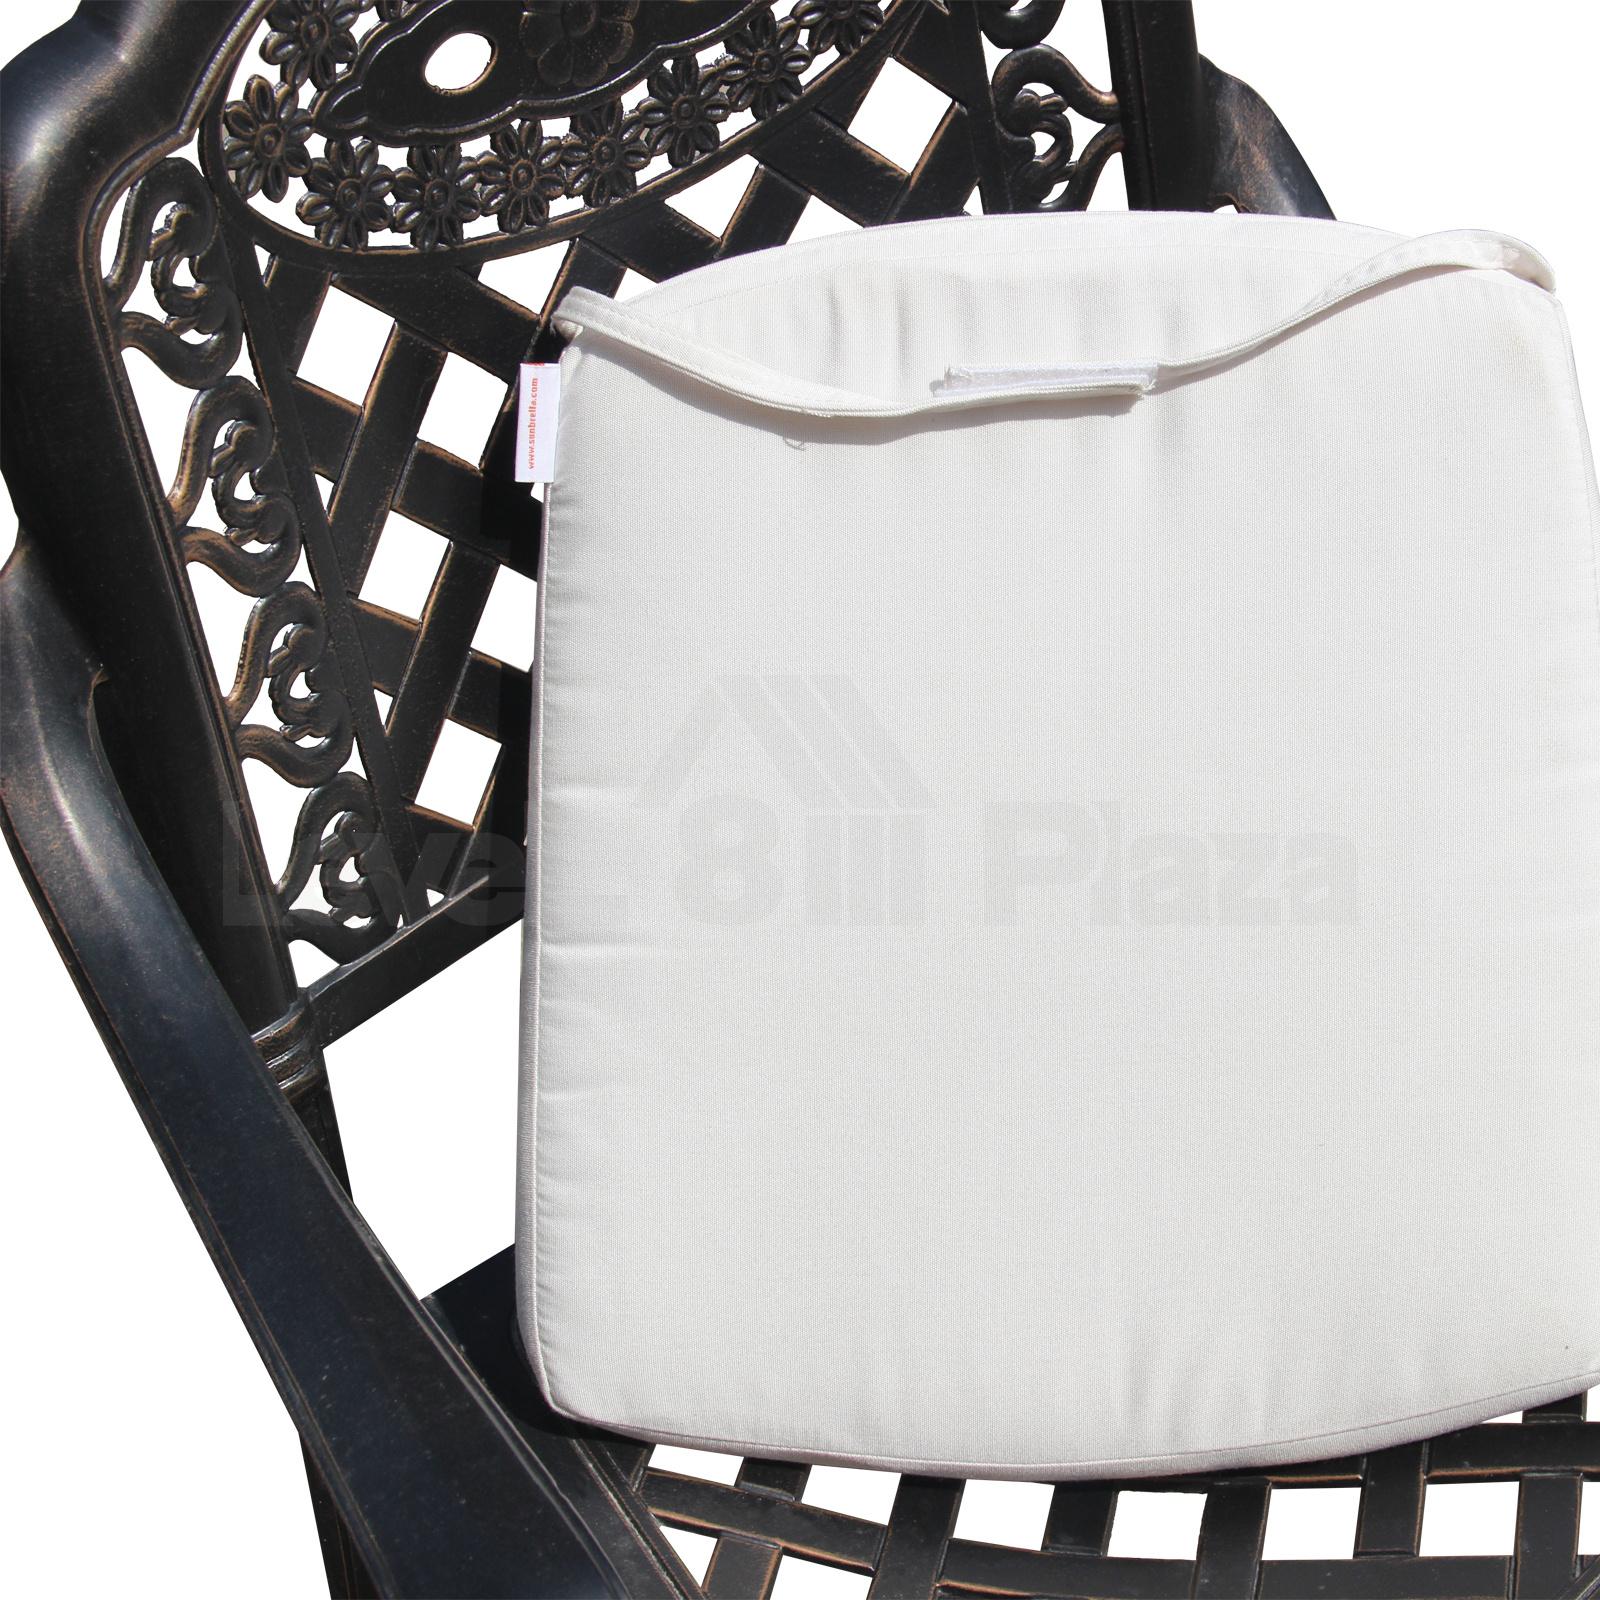 New Sunbrella Outdoor Chair Cushion Tie On Patio Seat Pad